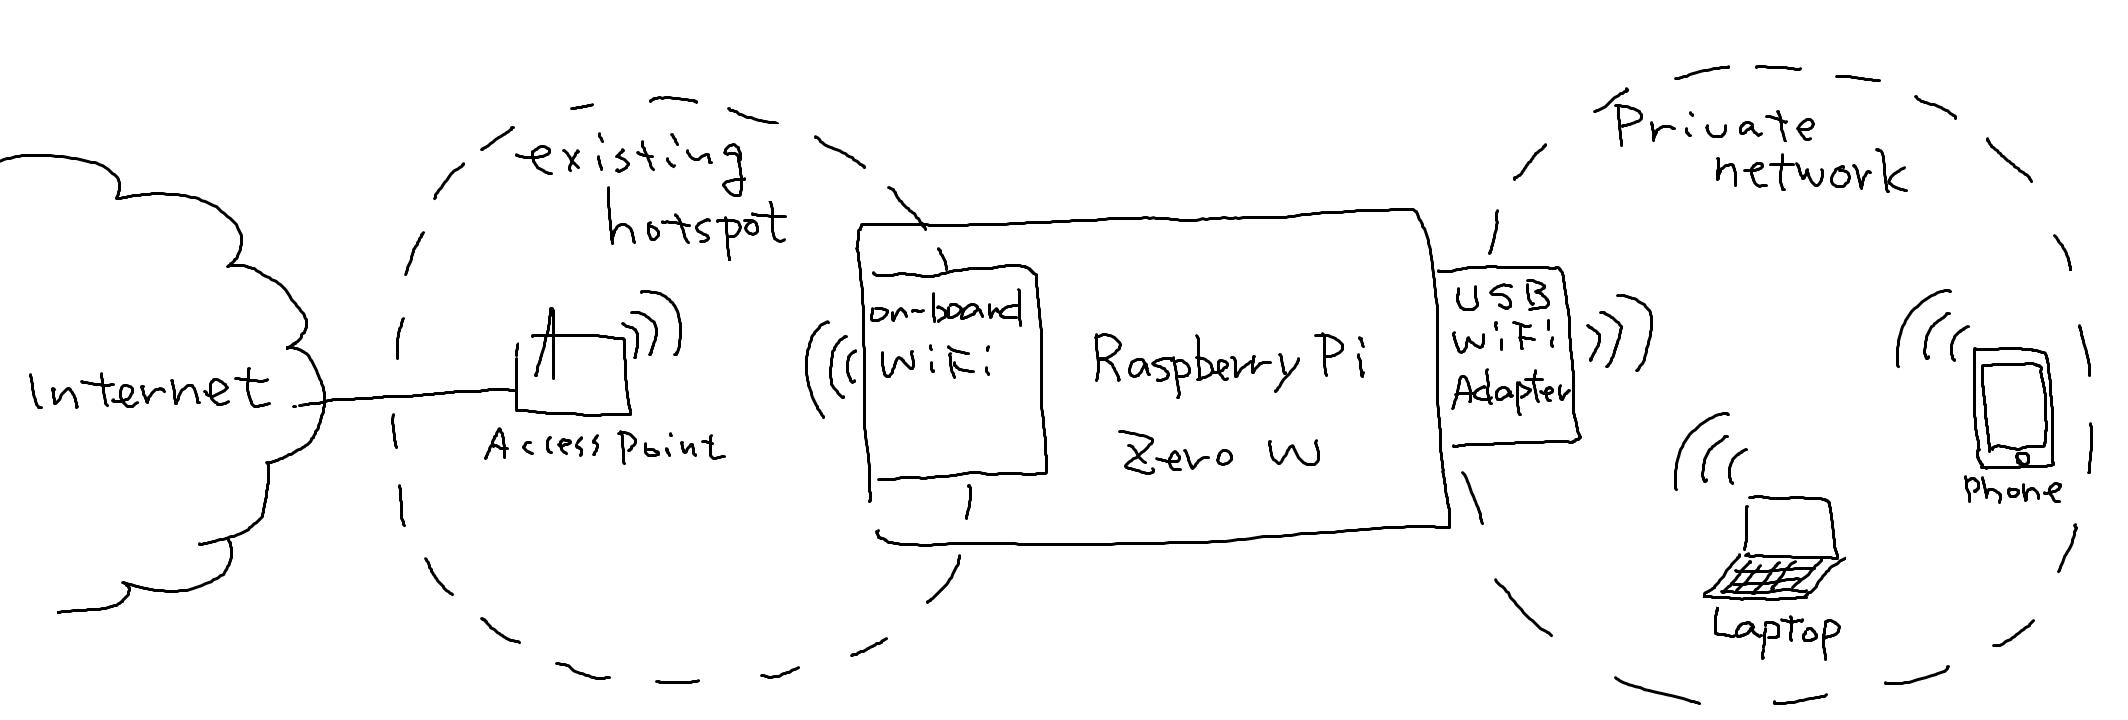 Creating Wireless Router using Raspberry Pi Zero W